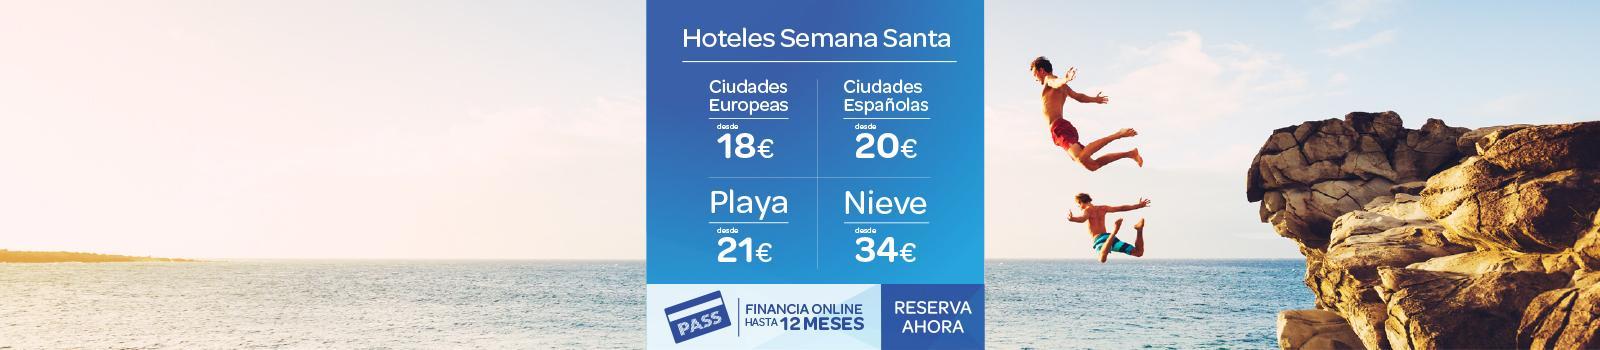 Ofertas Hoteles Semana Santa